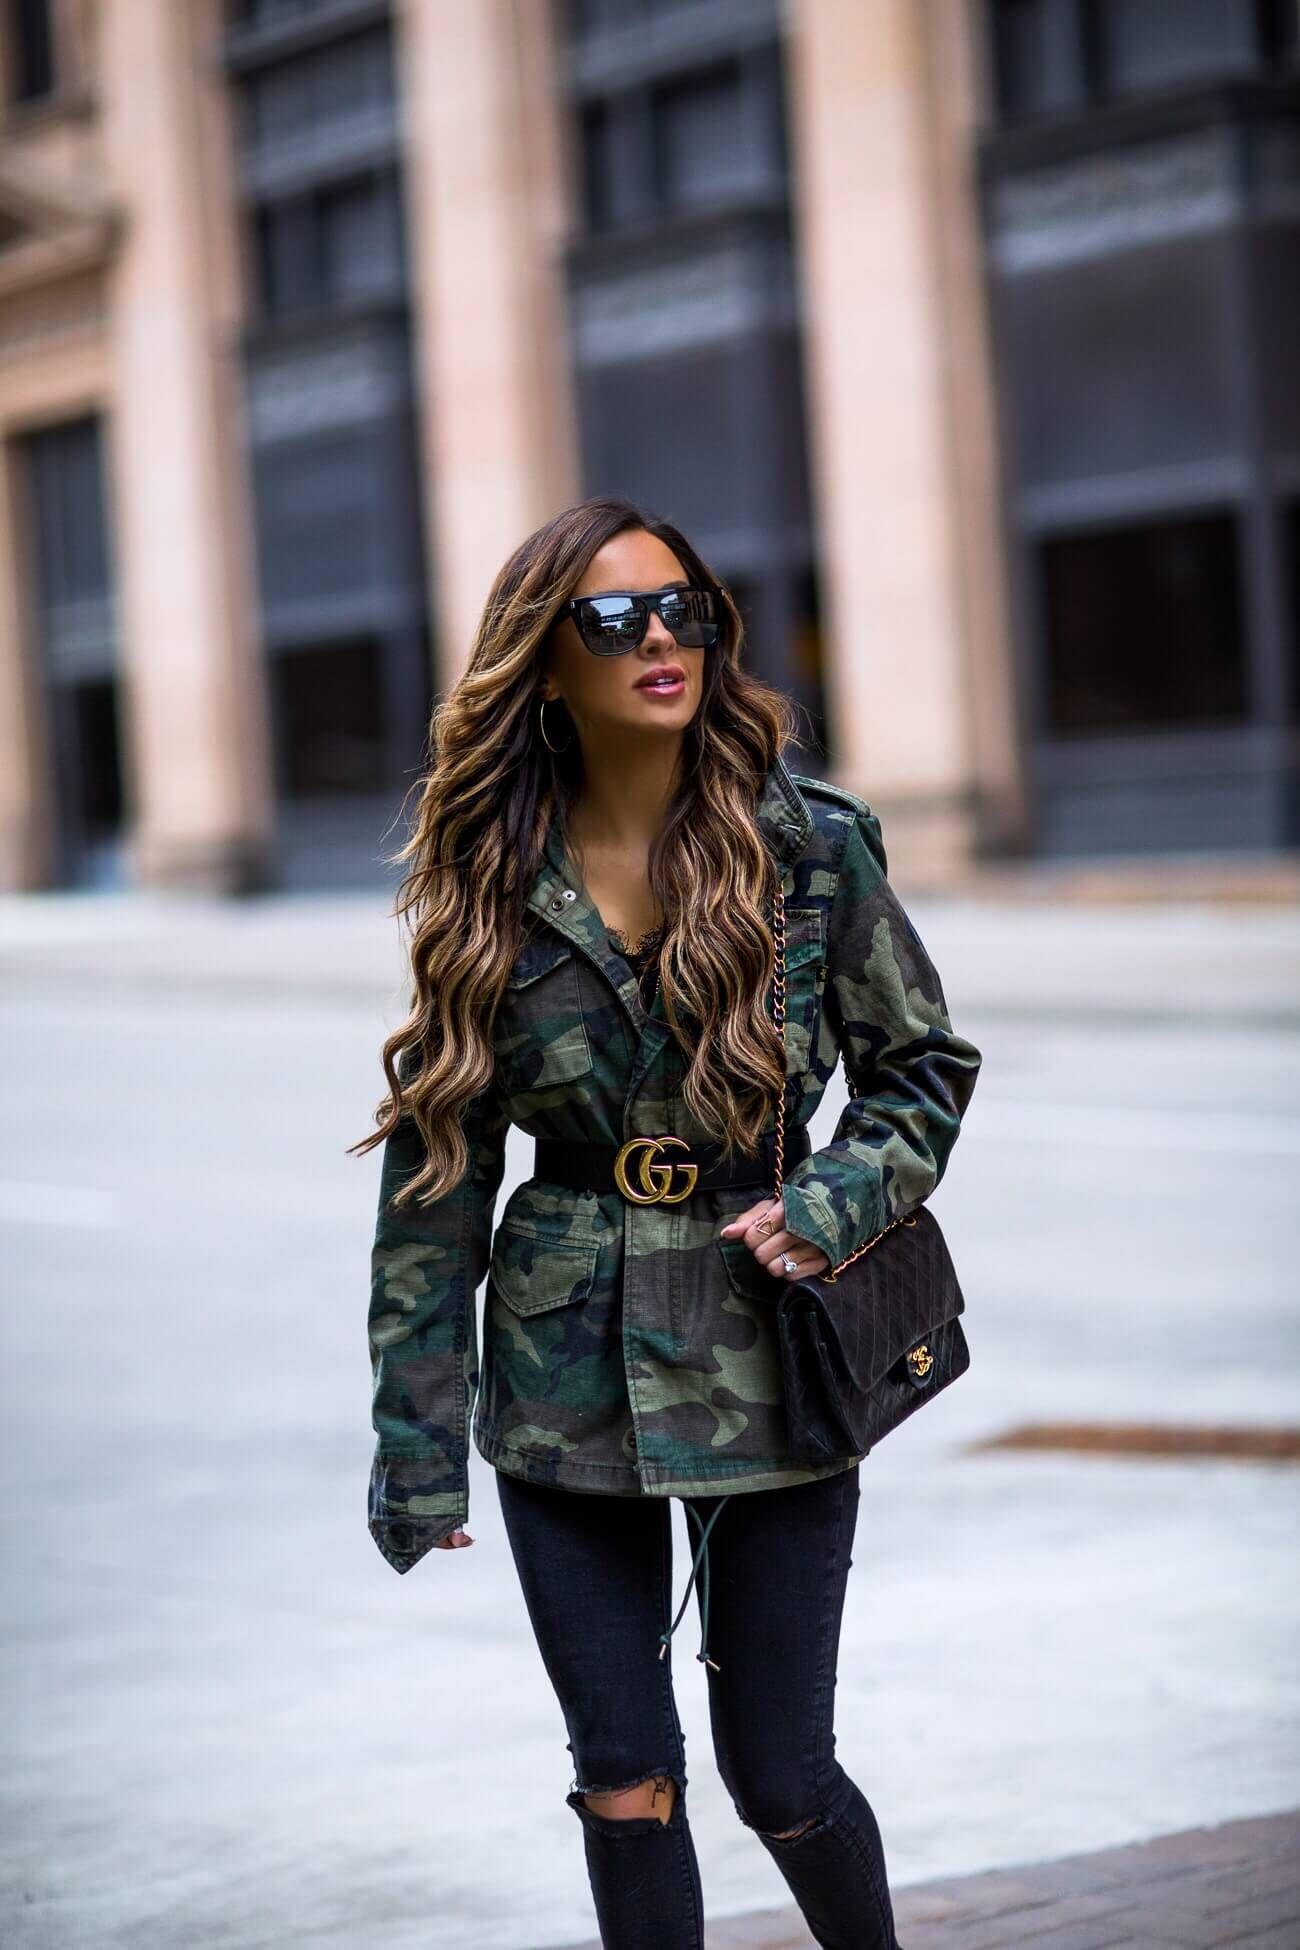 b61390c90bc fashion blogger mia mia mine wearing a camo jacket from shopbnop and a gucci  belt